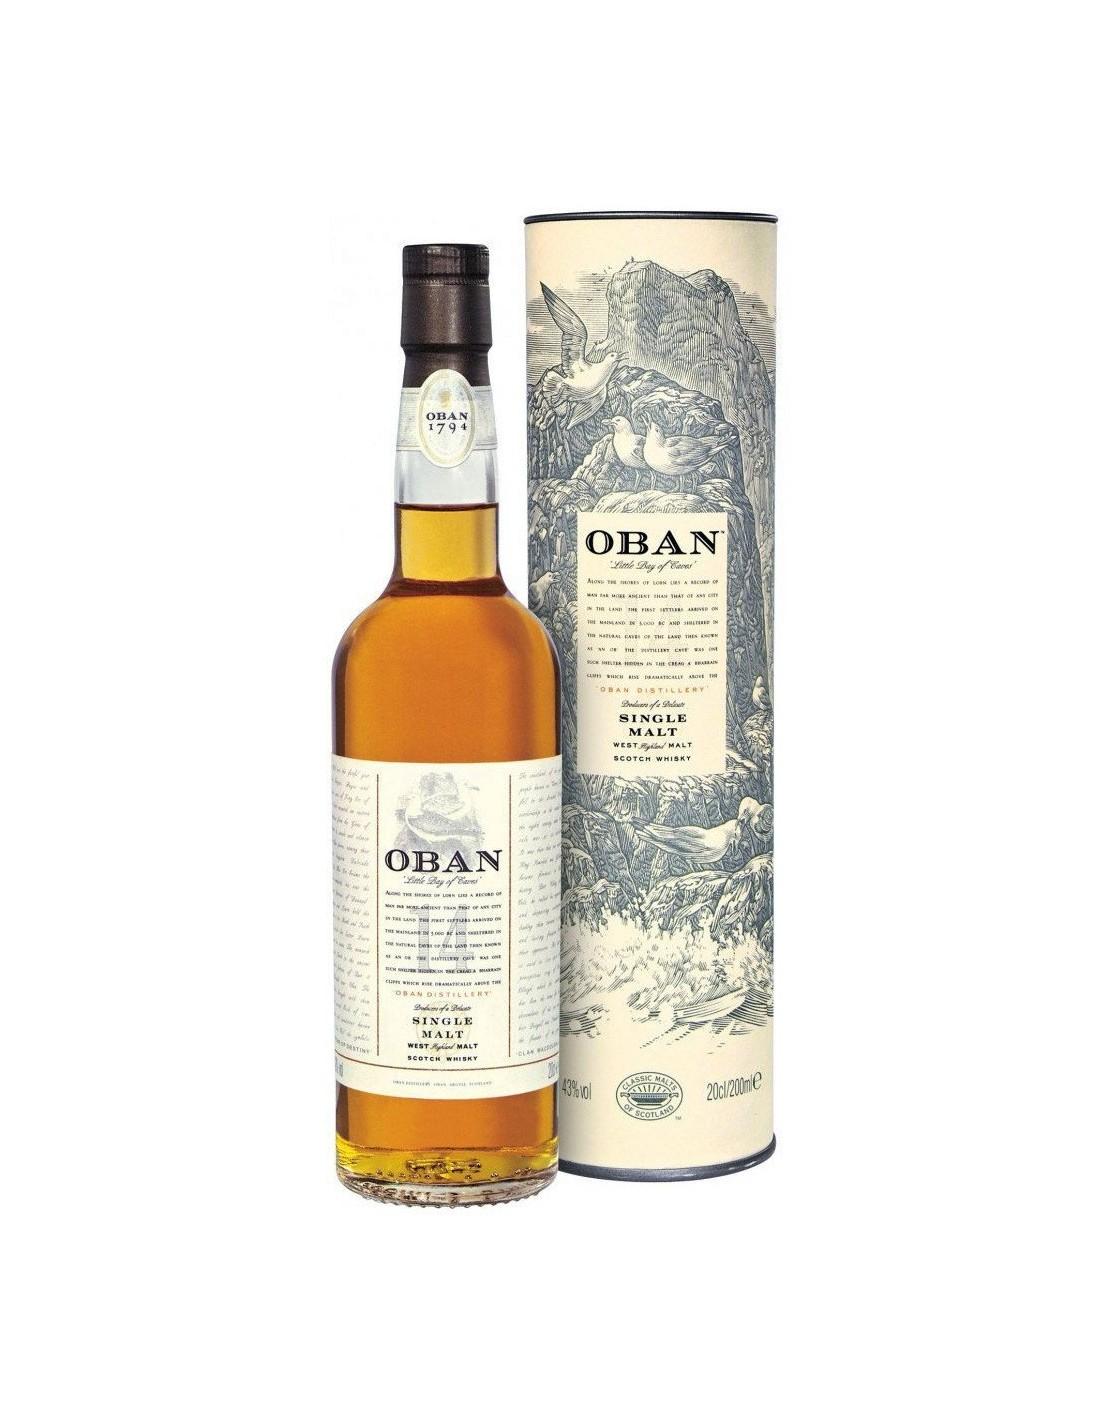 Whisky Oban, 14 ani, 43% alc., 0.7L, Scotia